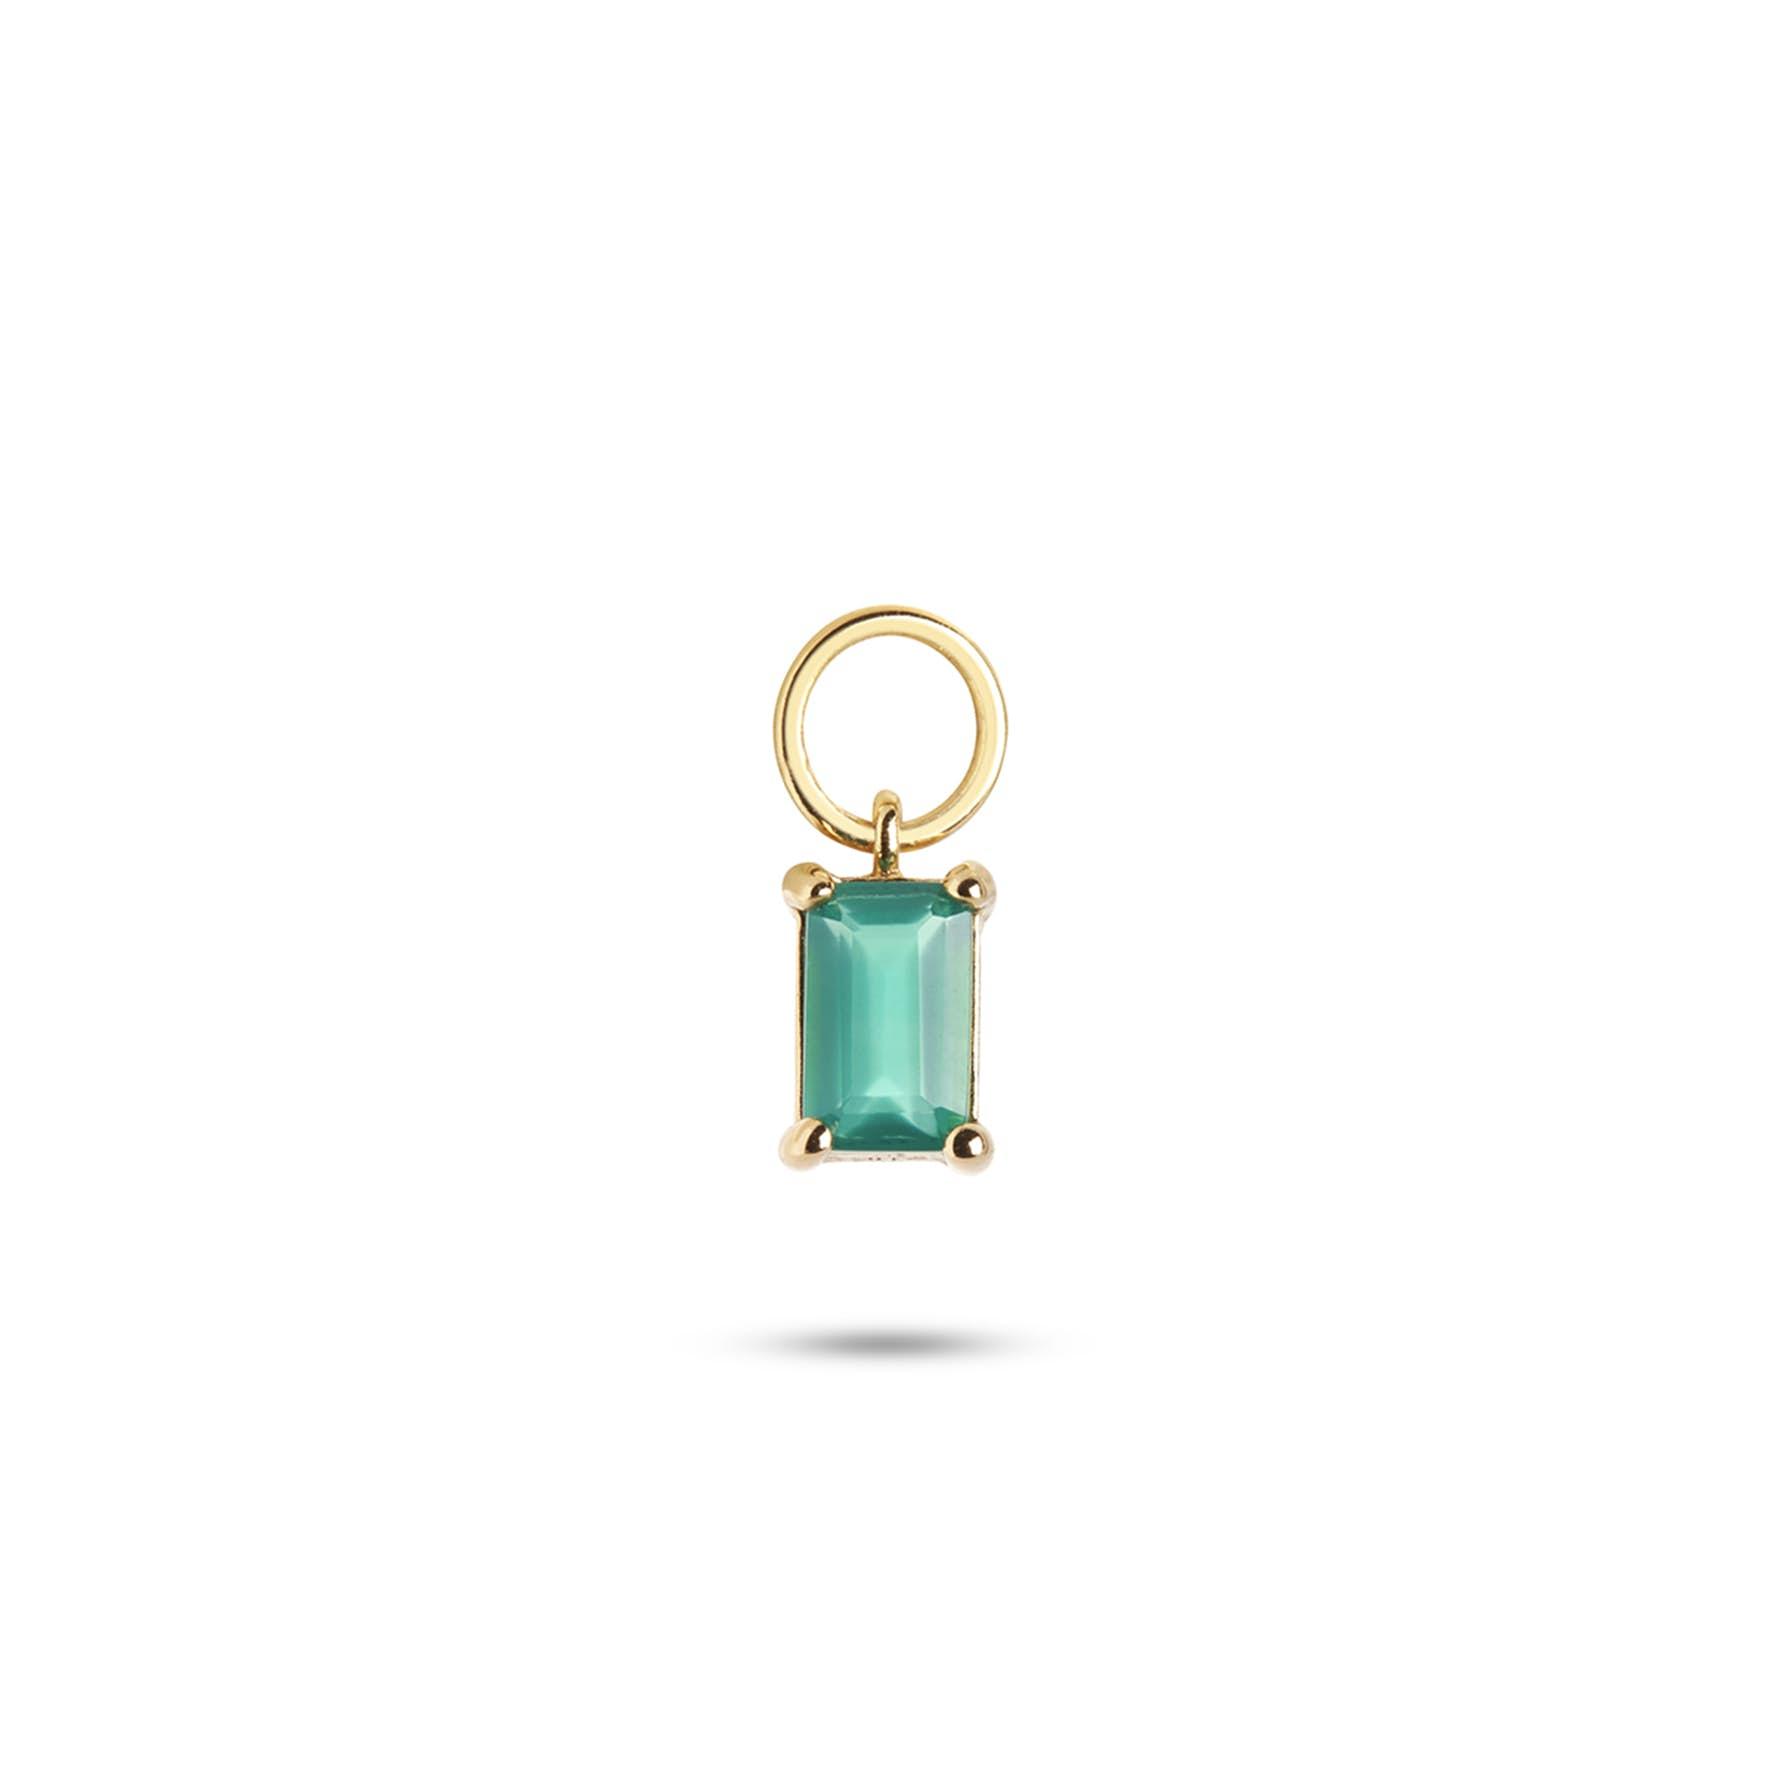 Gem Candy Pendant Confidence von Carré in Vergoldet-Silber Sterling 925